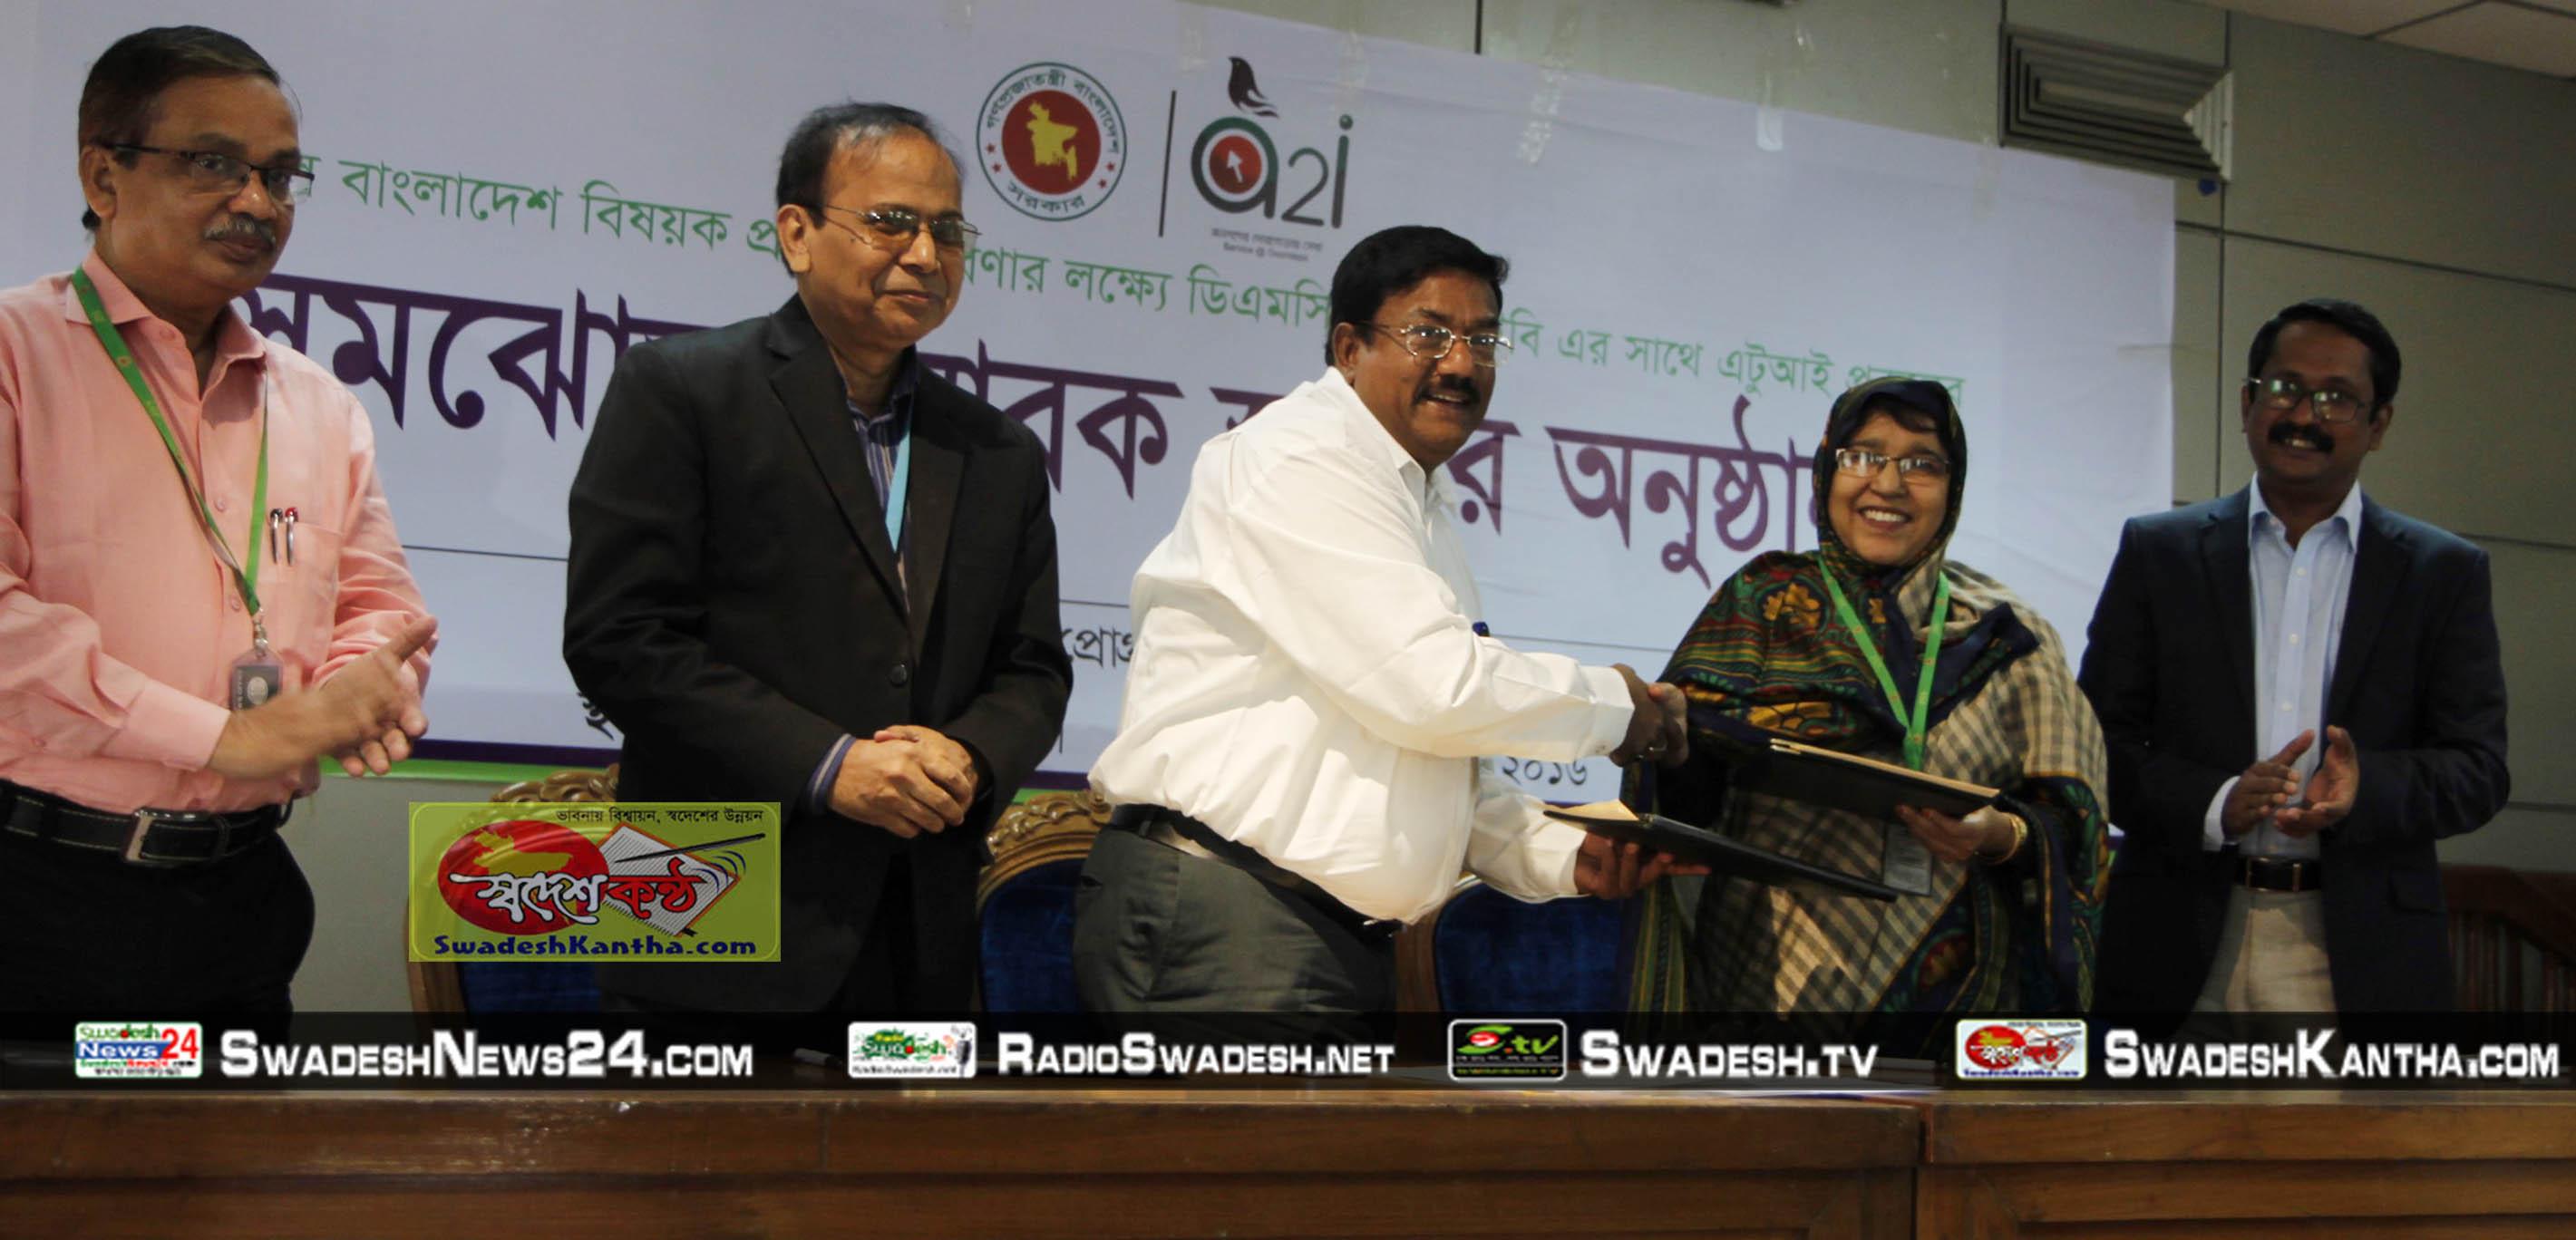 MoU between a2i, DMC & PIB swadeshkantha-saimur